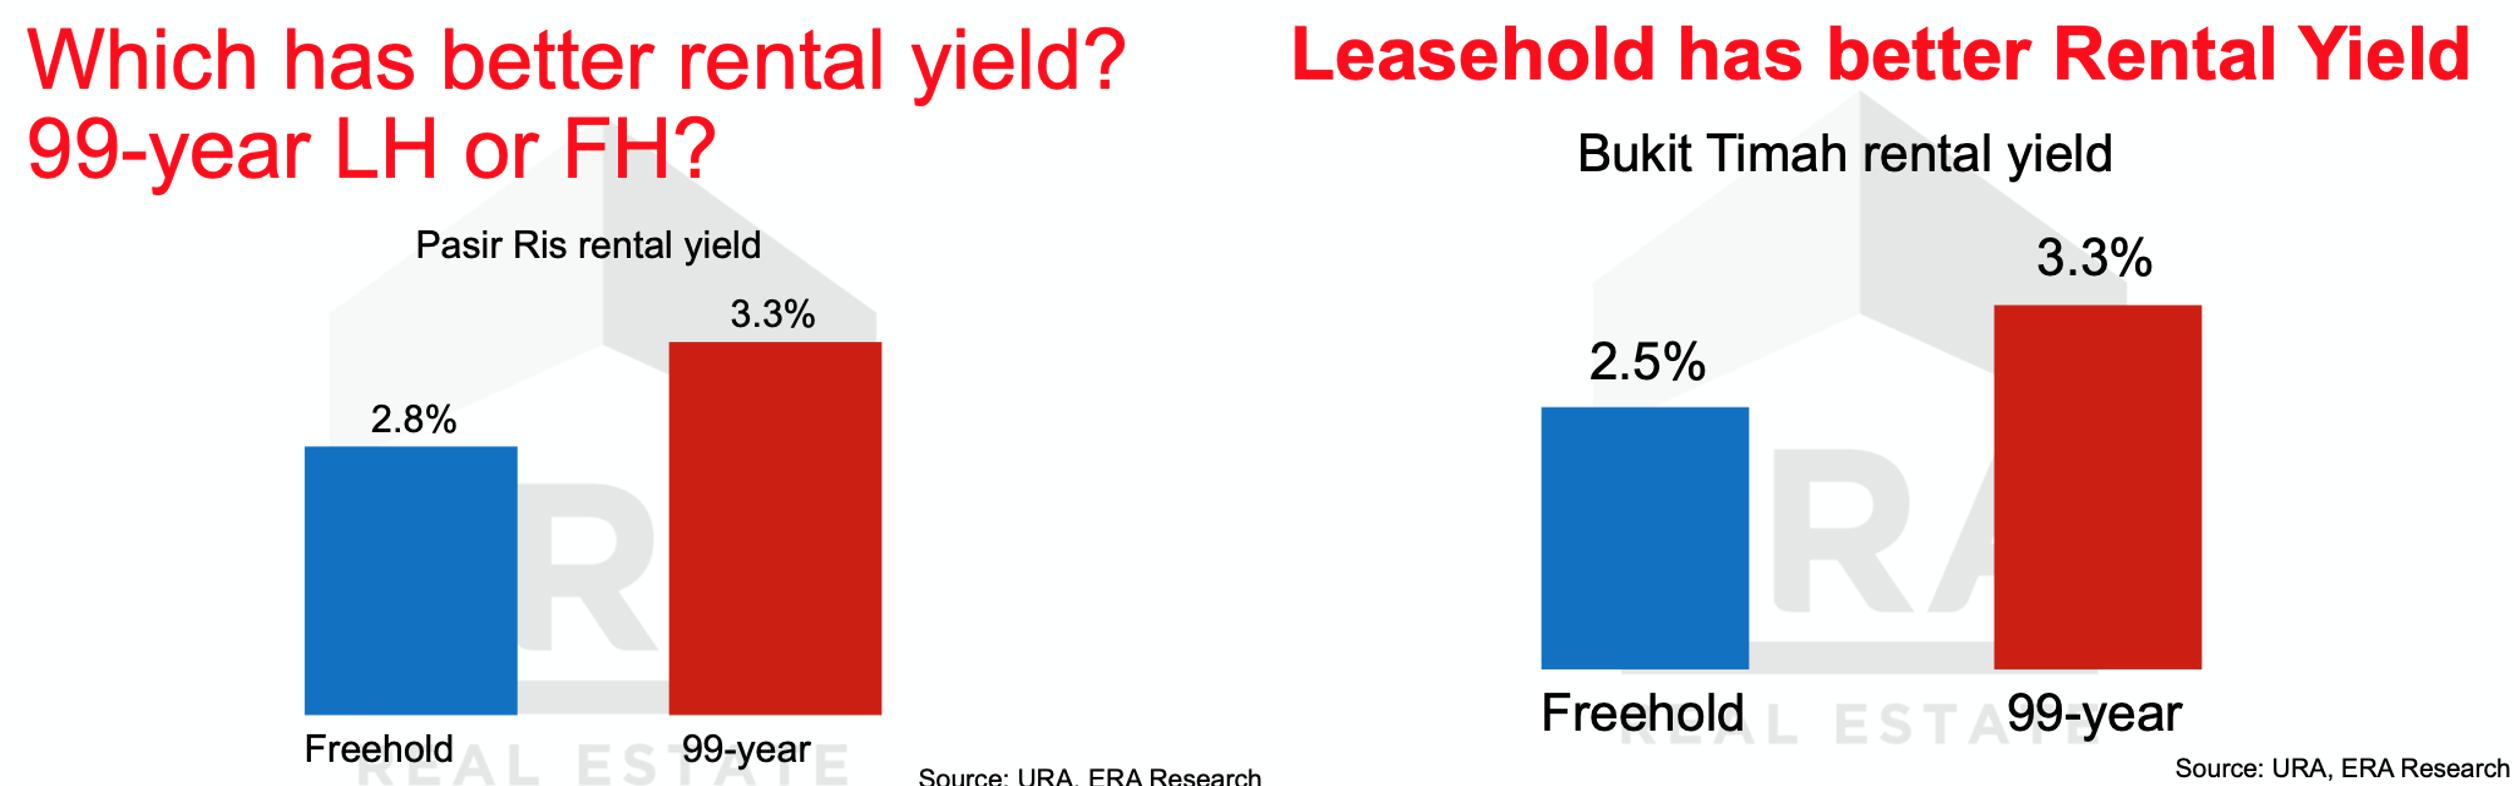 FH vs LH Rental Yield